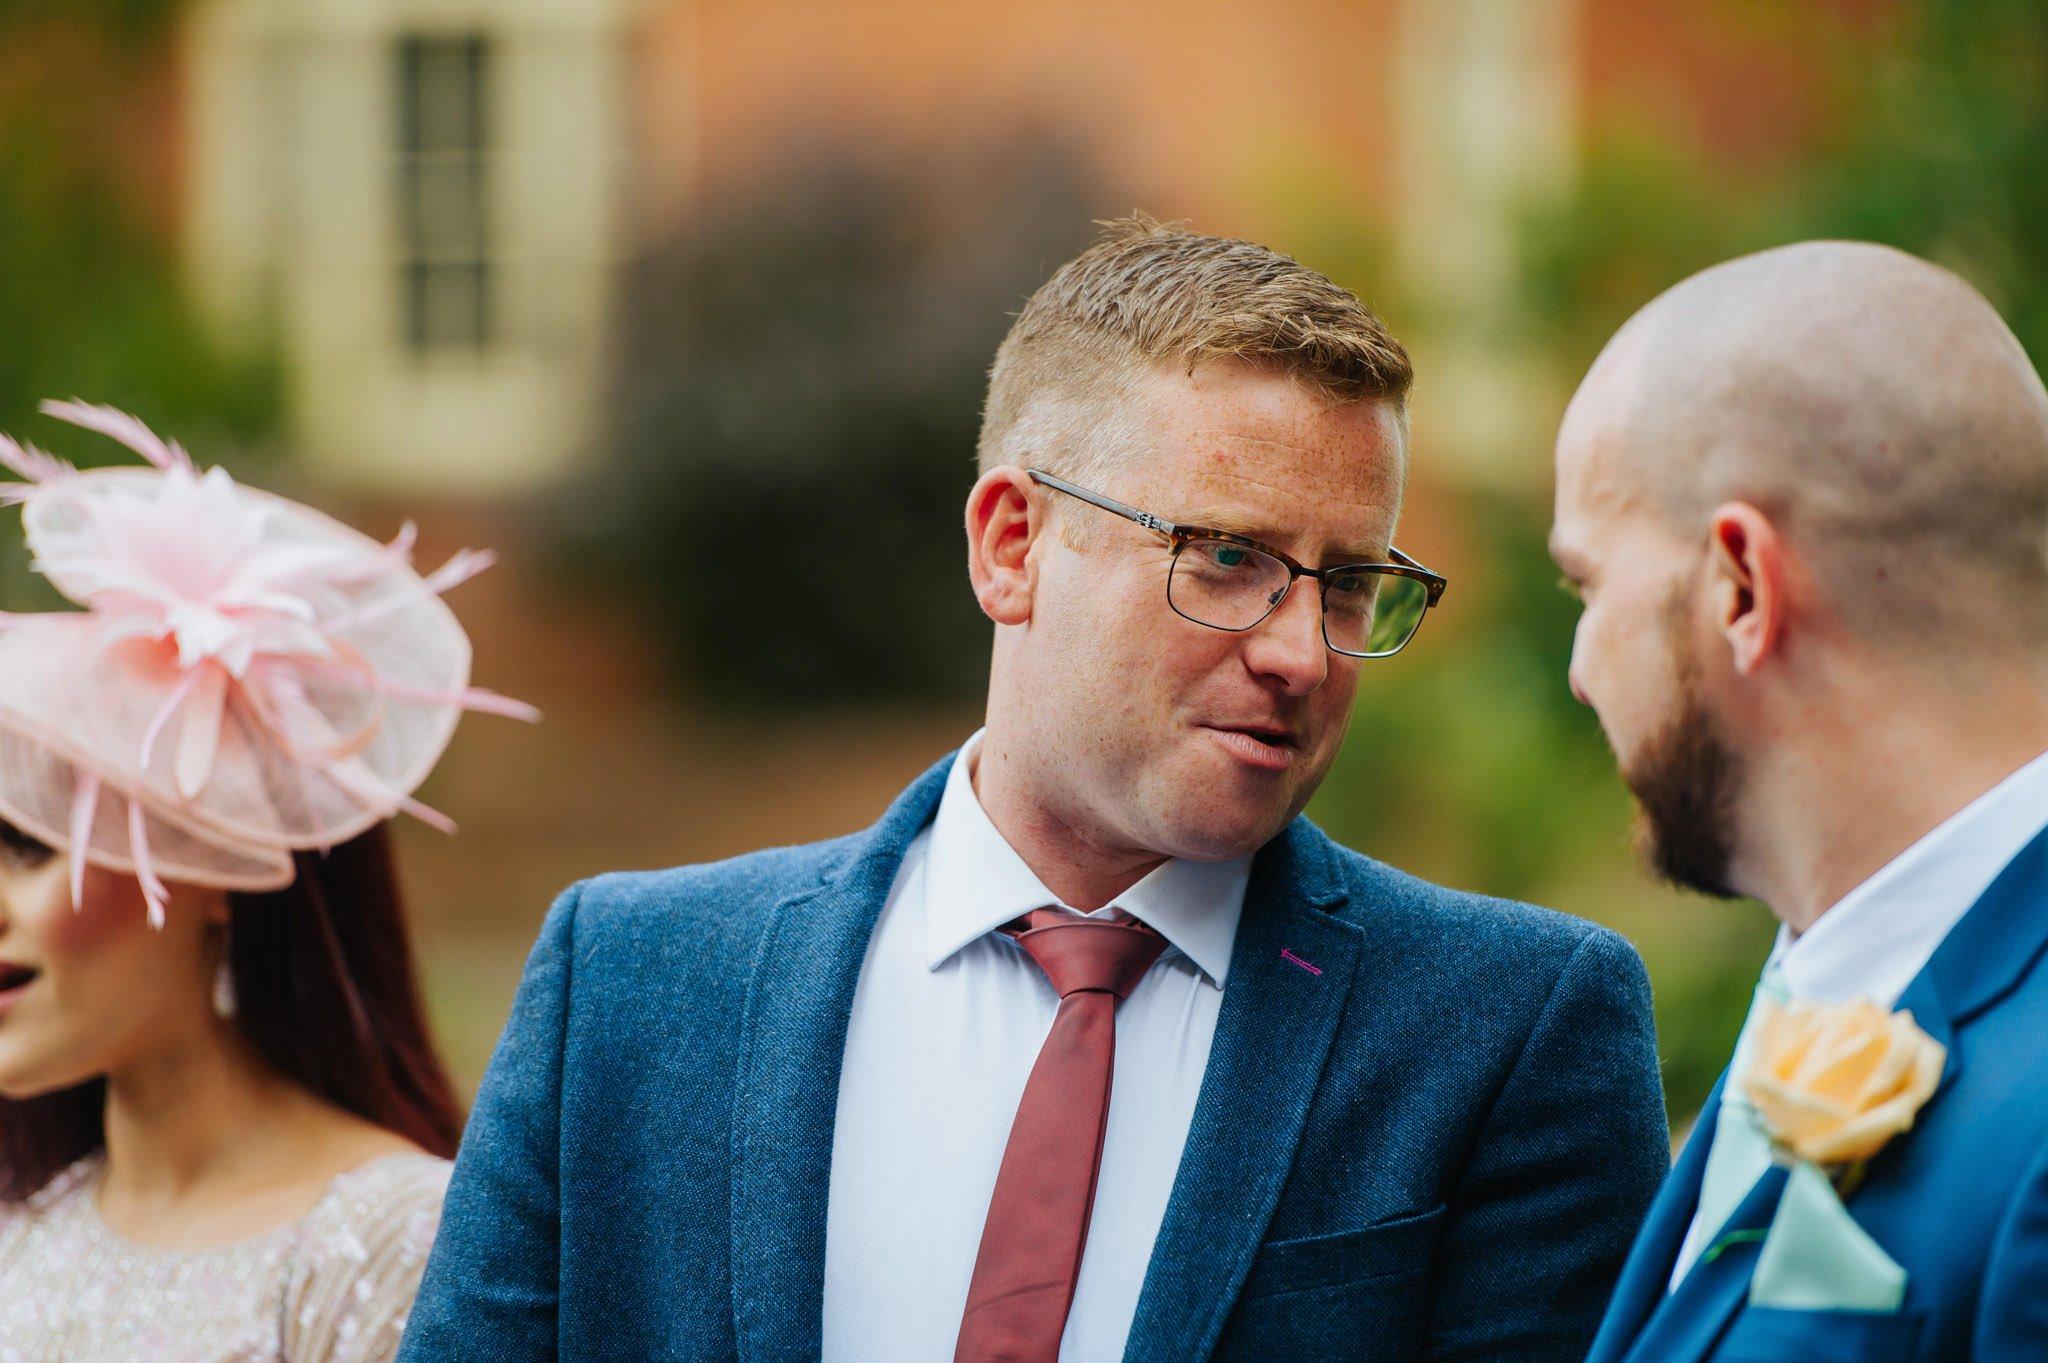 Eastnor Castle wedding photographer Herefordshire, West Midlands - Sarah + Dean 22